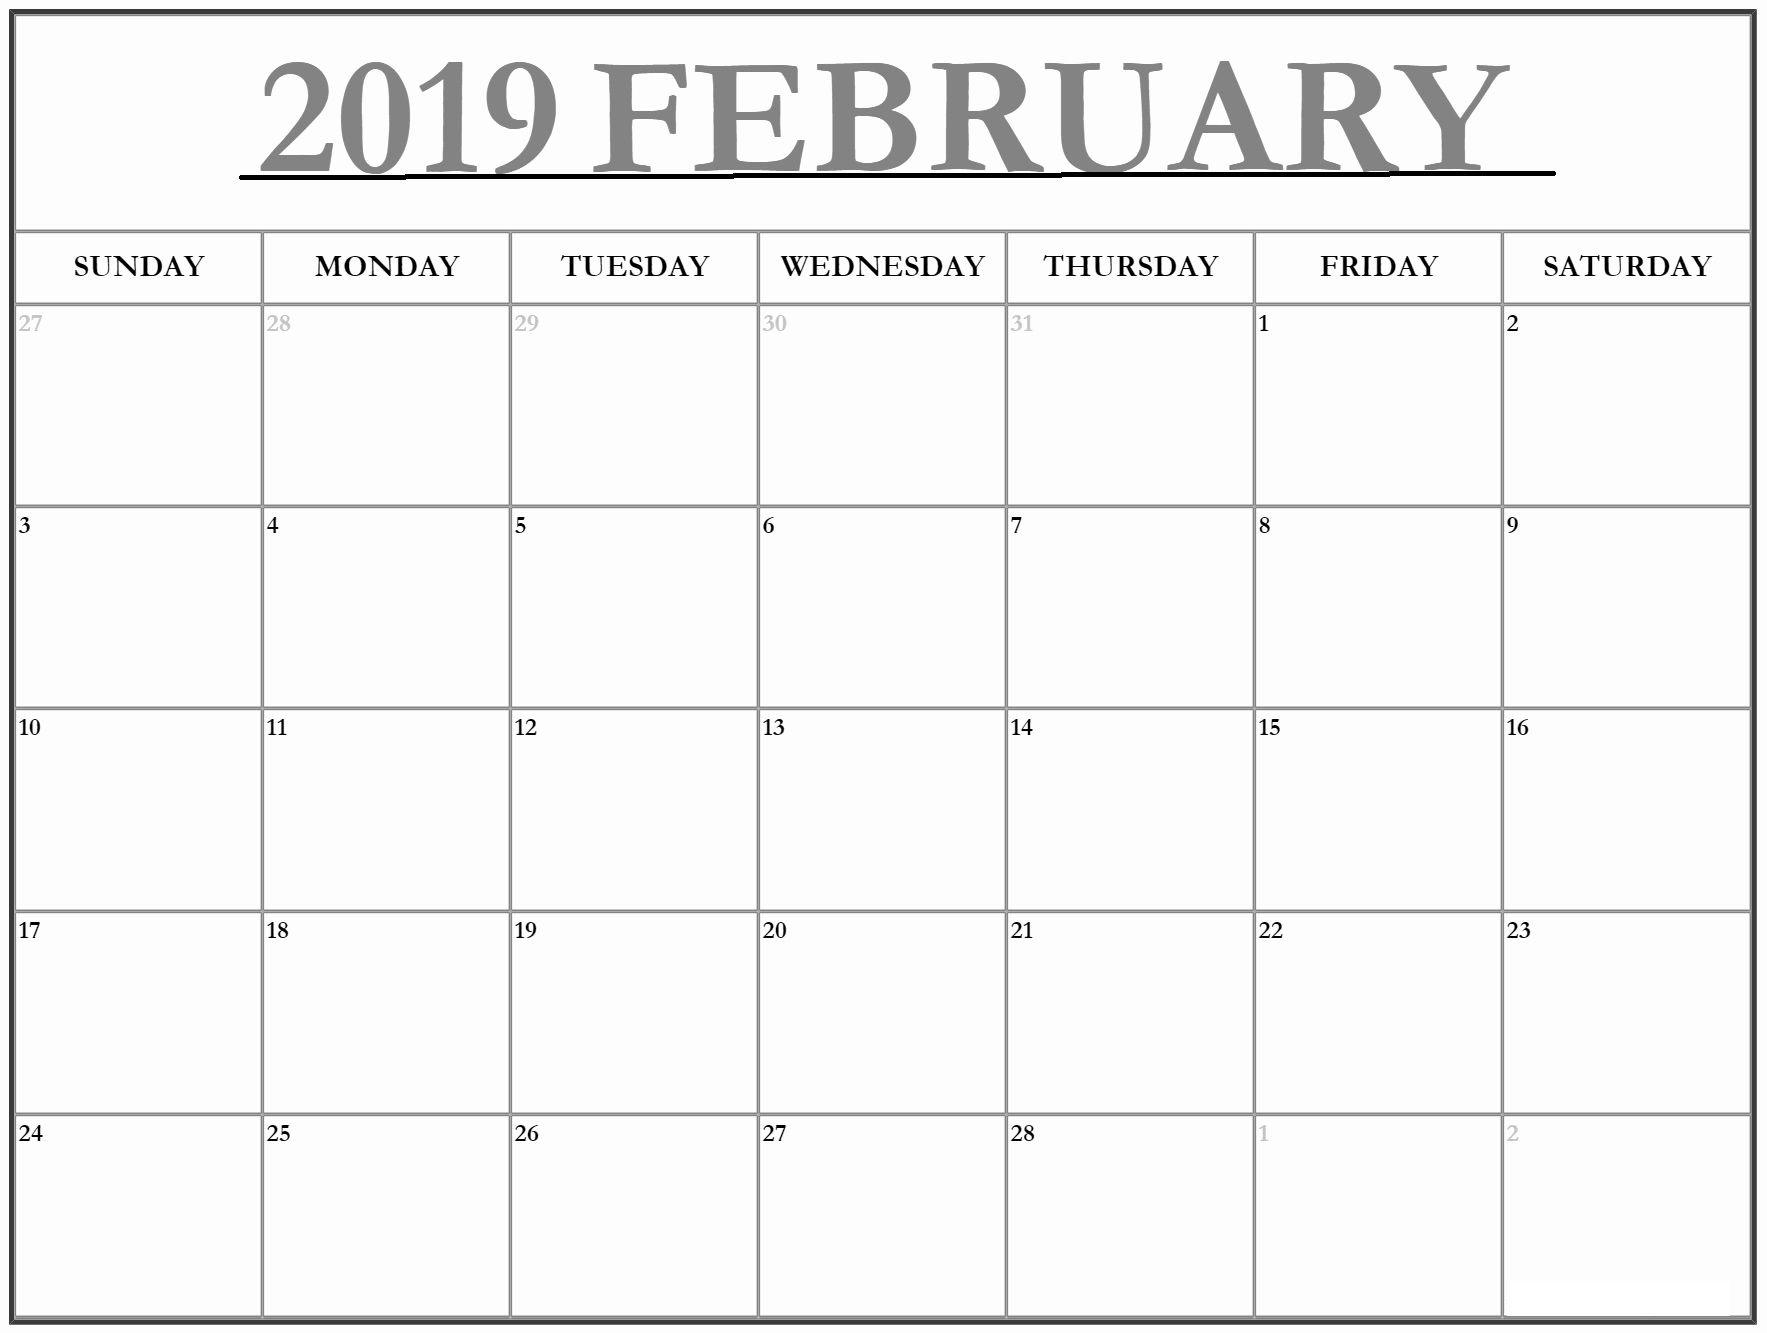 February 2019 Calendar Template Large   February 2019 Calendar throughout Large Blank Monthly Calendars January Printable